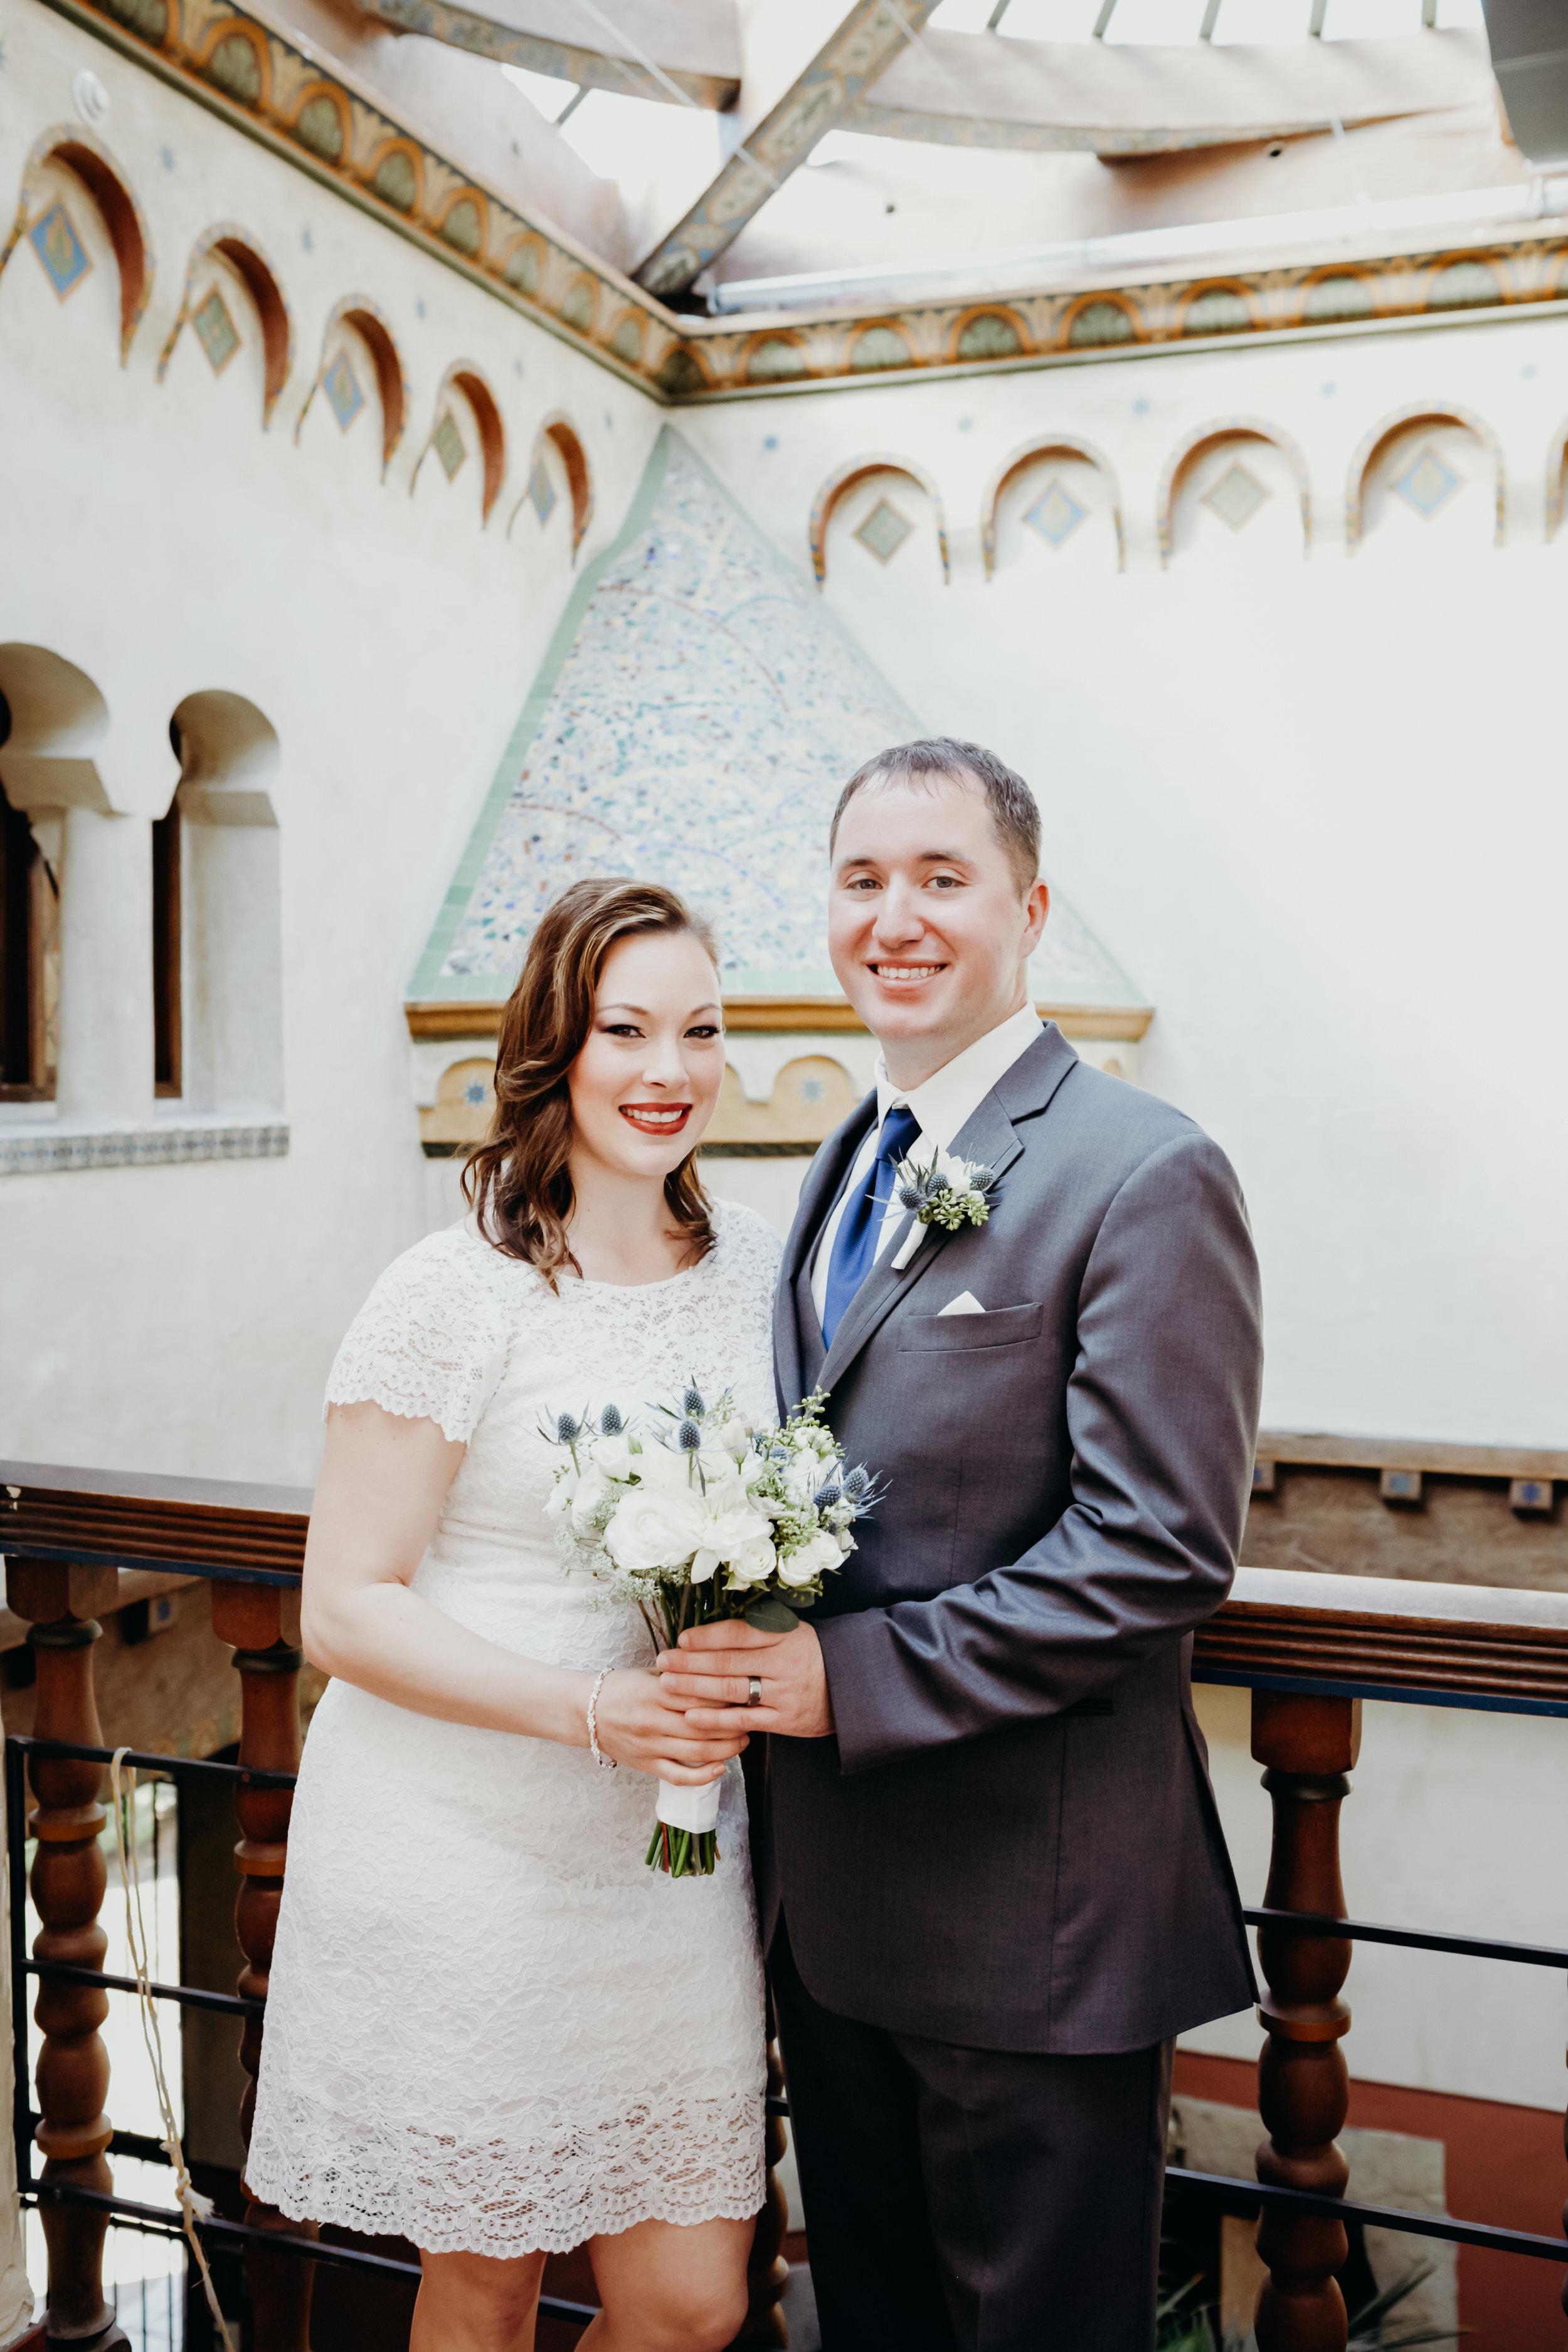 Gianna Keiko Atlanta Destination Wedding Elopement Photographer-12.jpg